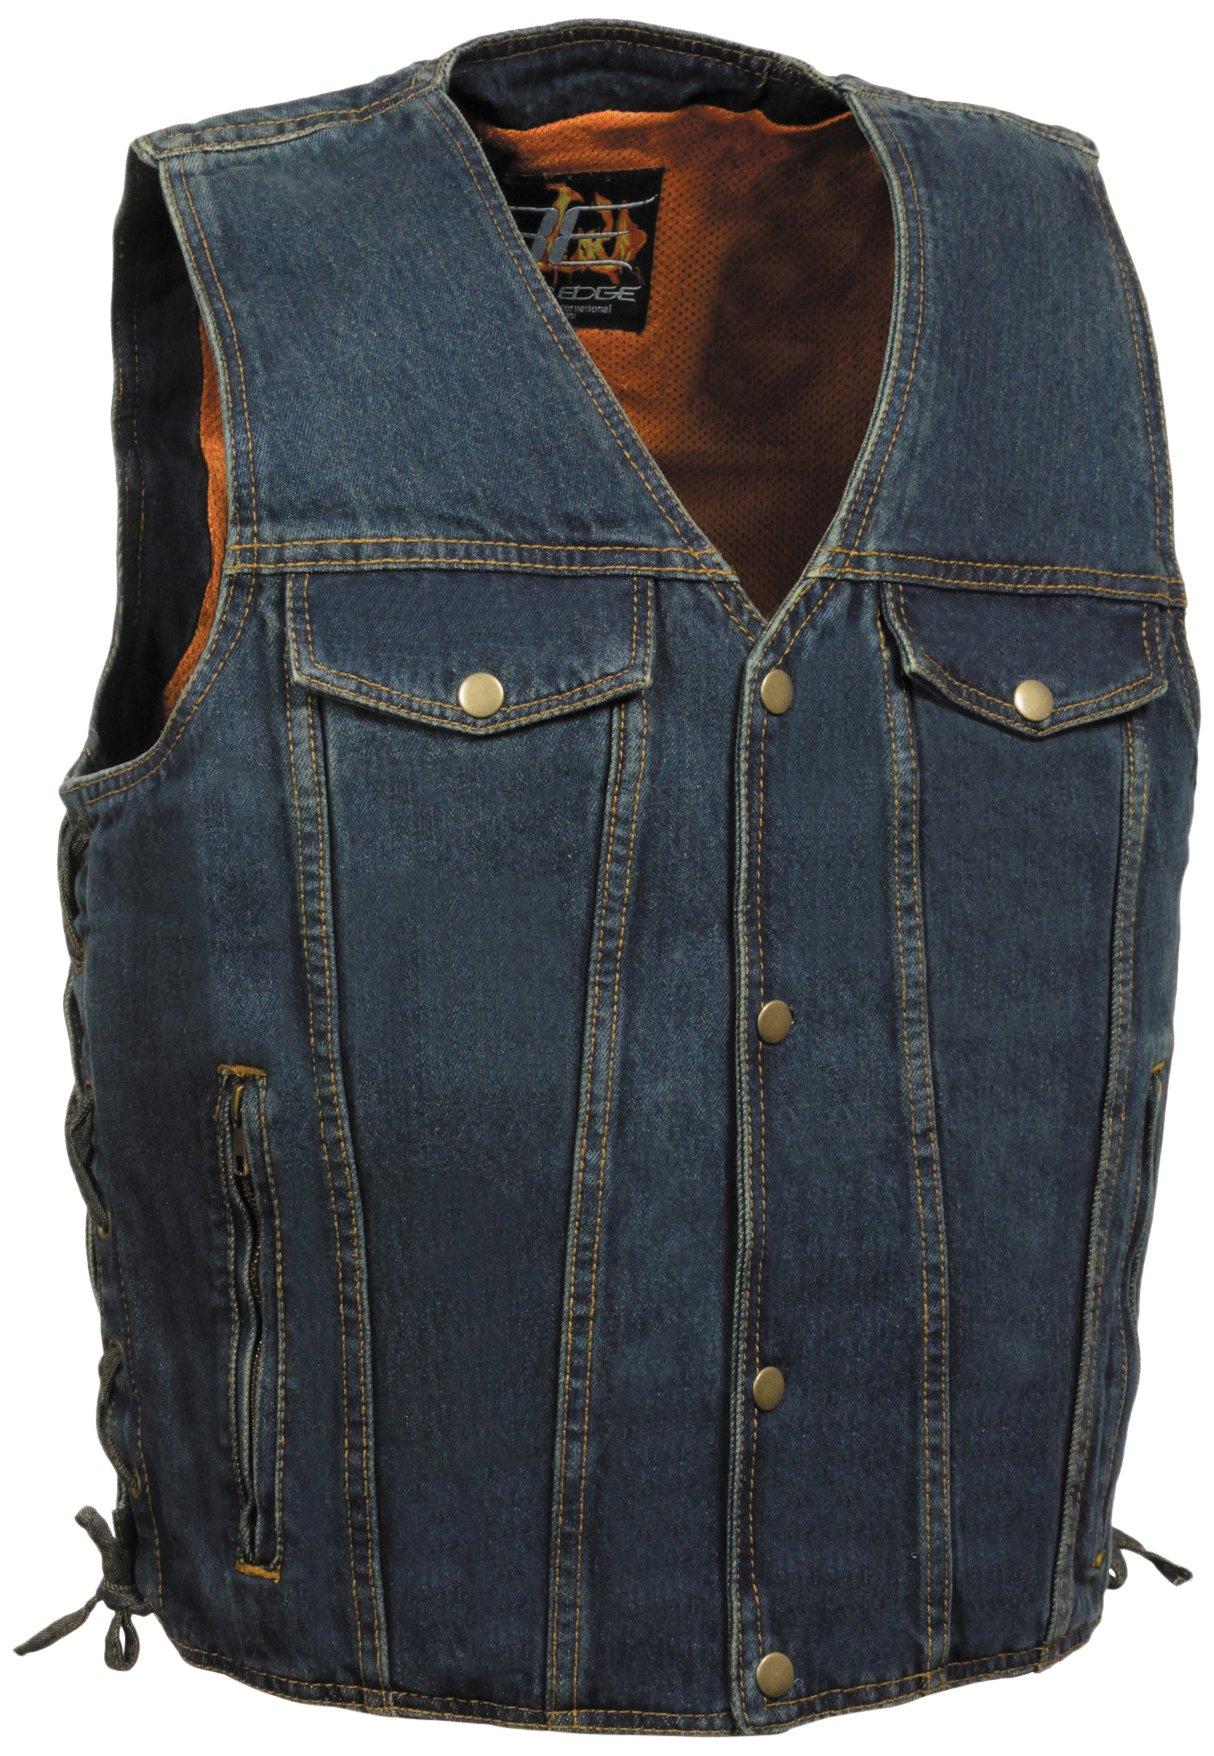 Milwaukee Performance DM1360-BLU-XL MILWAUKEE PERFORMANCE Men's Denim Style Vest with 2 Front Zippered Pockets(Blue, X-Large)